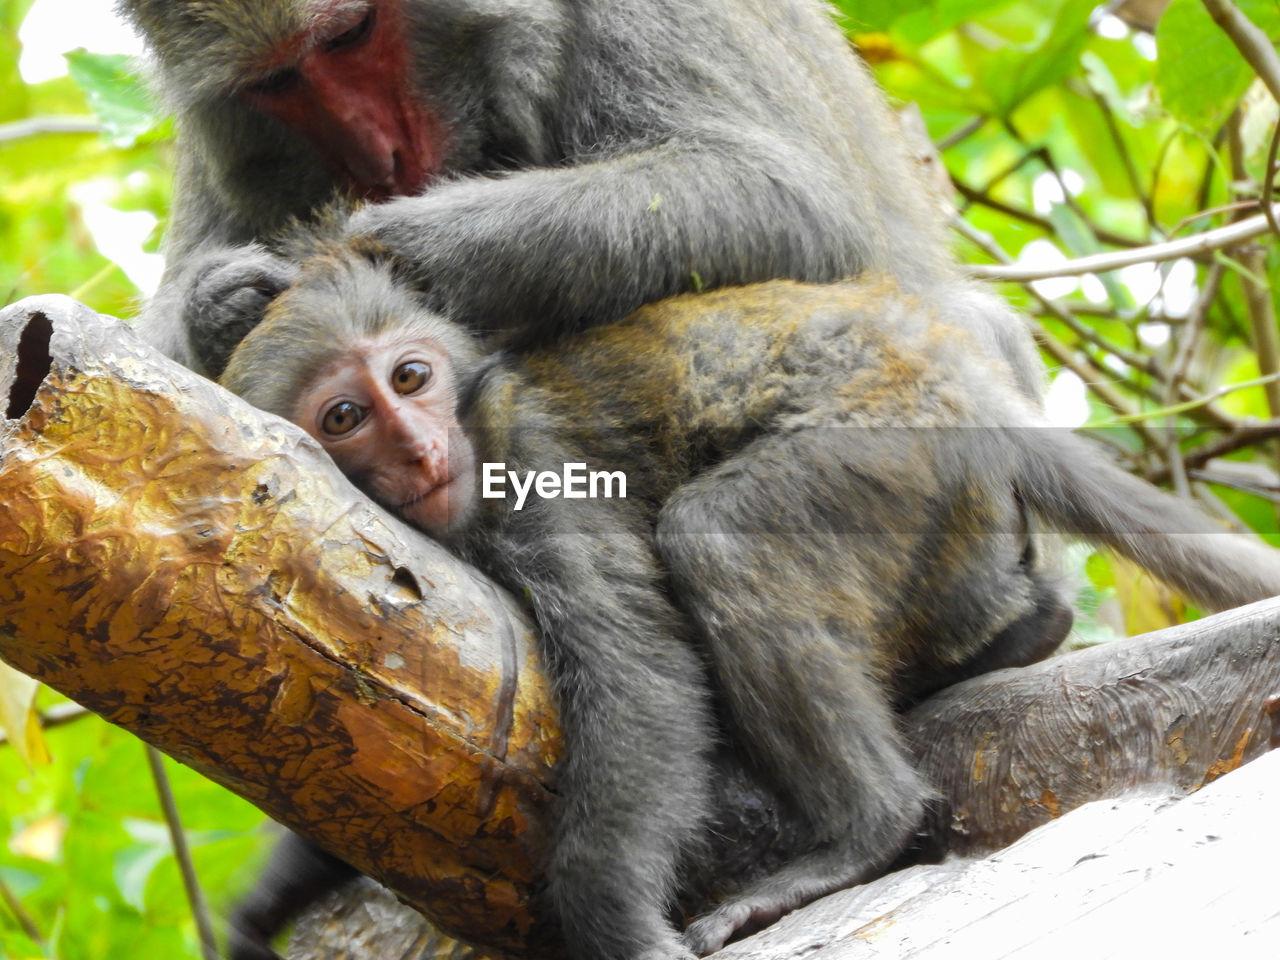 Close-up of monkey with baby monkey